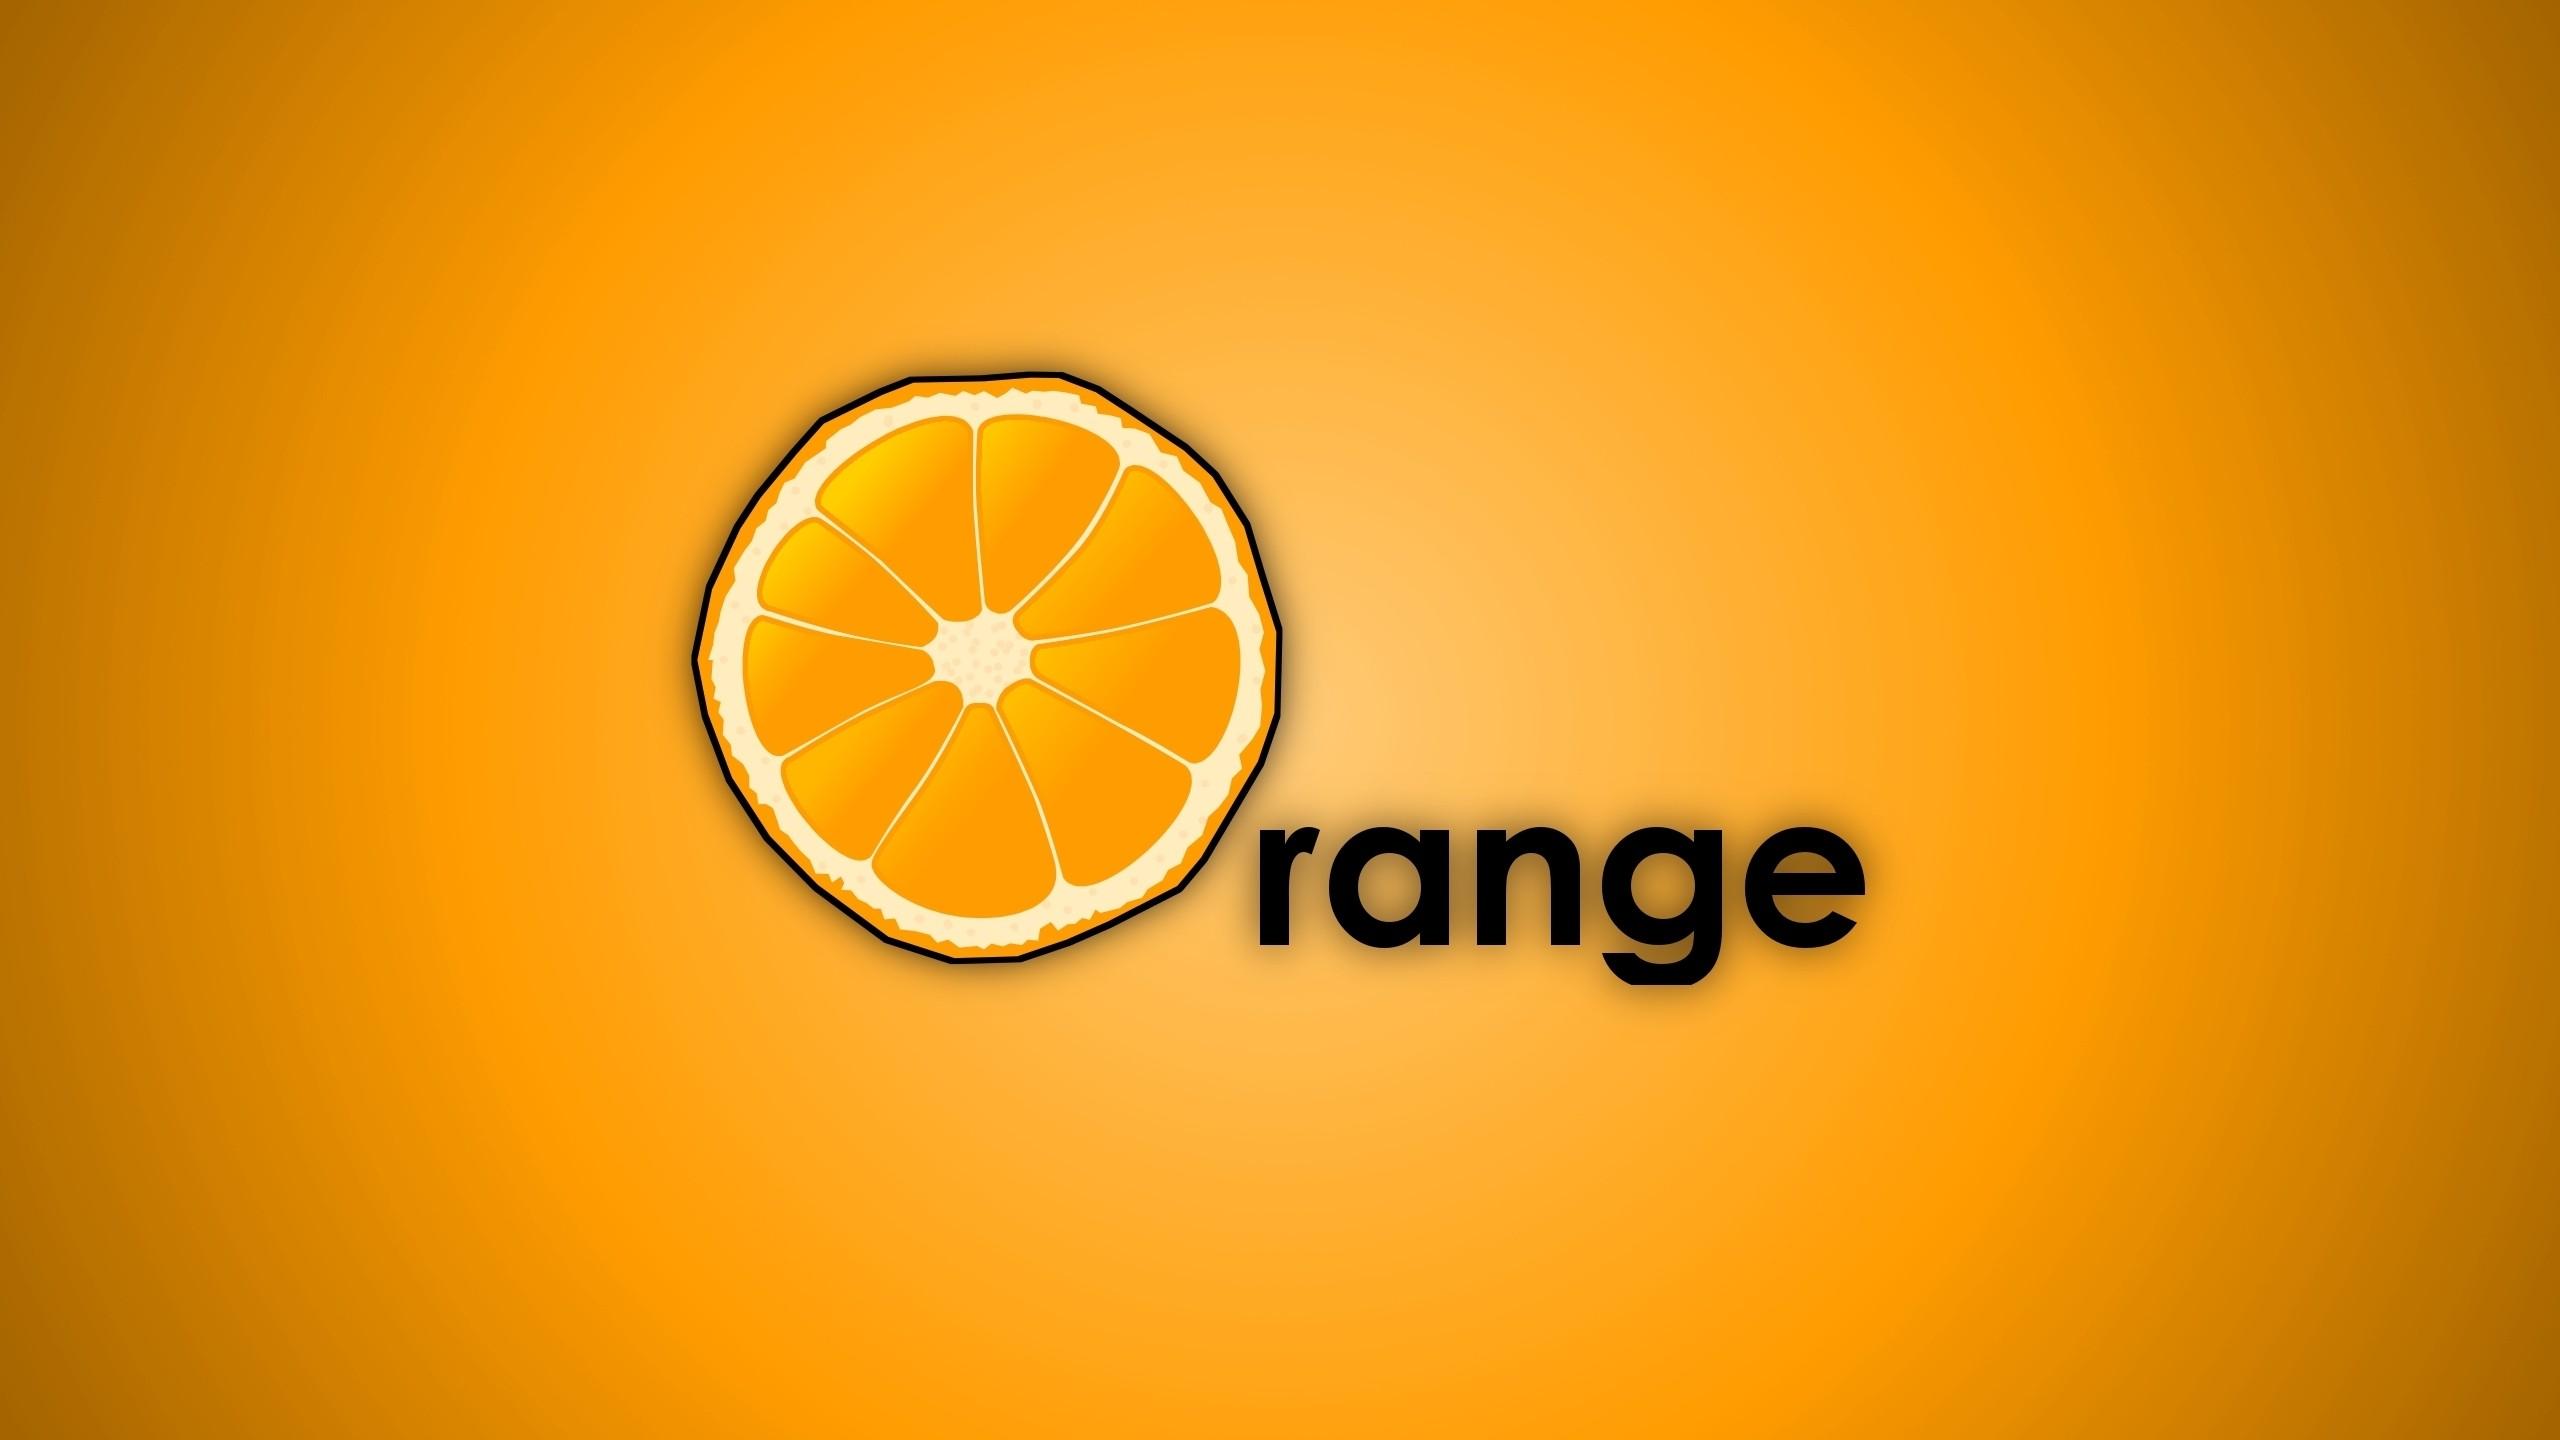 2560x1440 px fruits orange oranges simplistic yellow 1712451